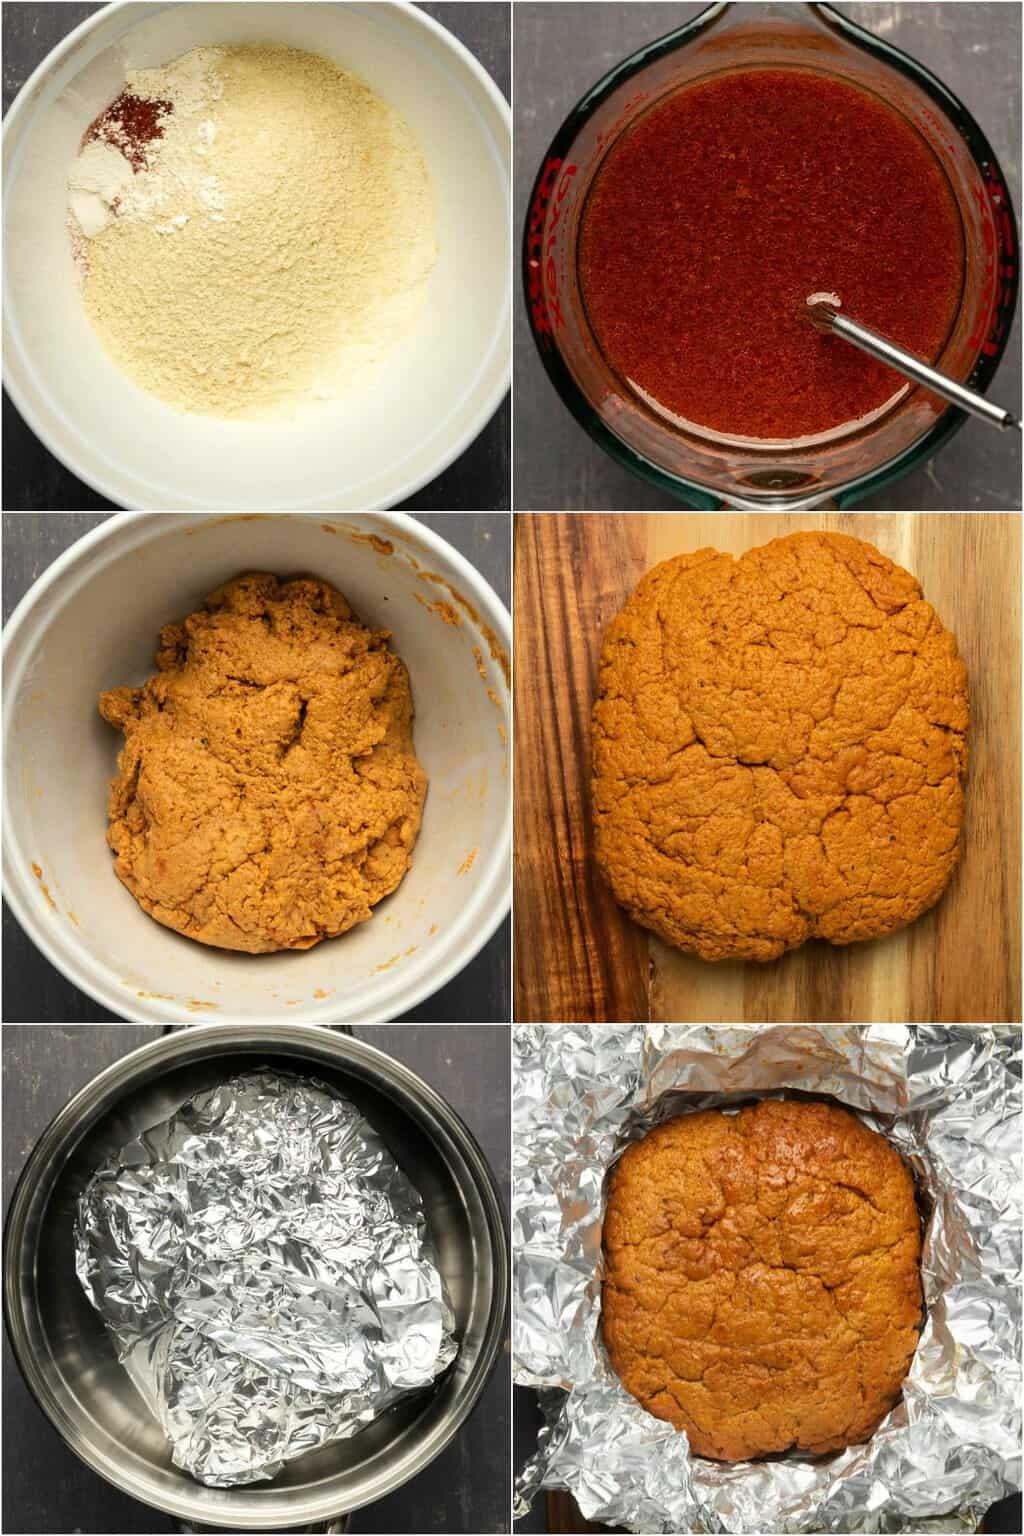 Step by step process photos of preparing the seitan dough for vegan bacon.